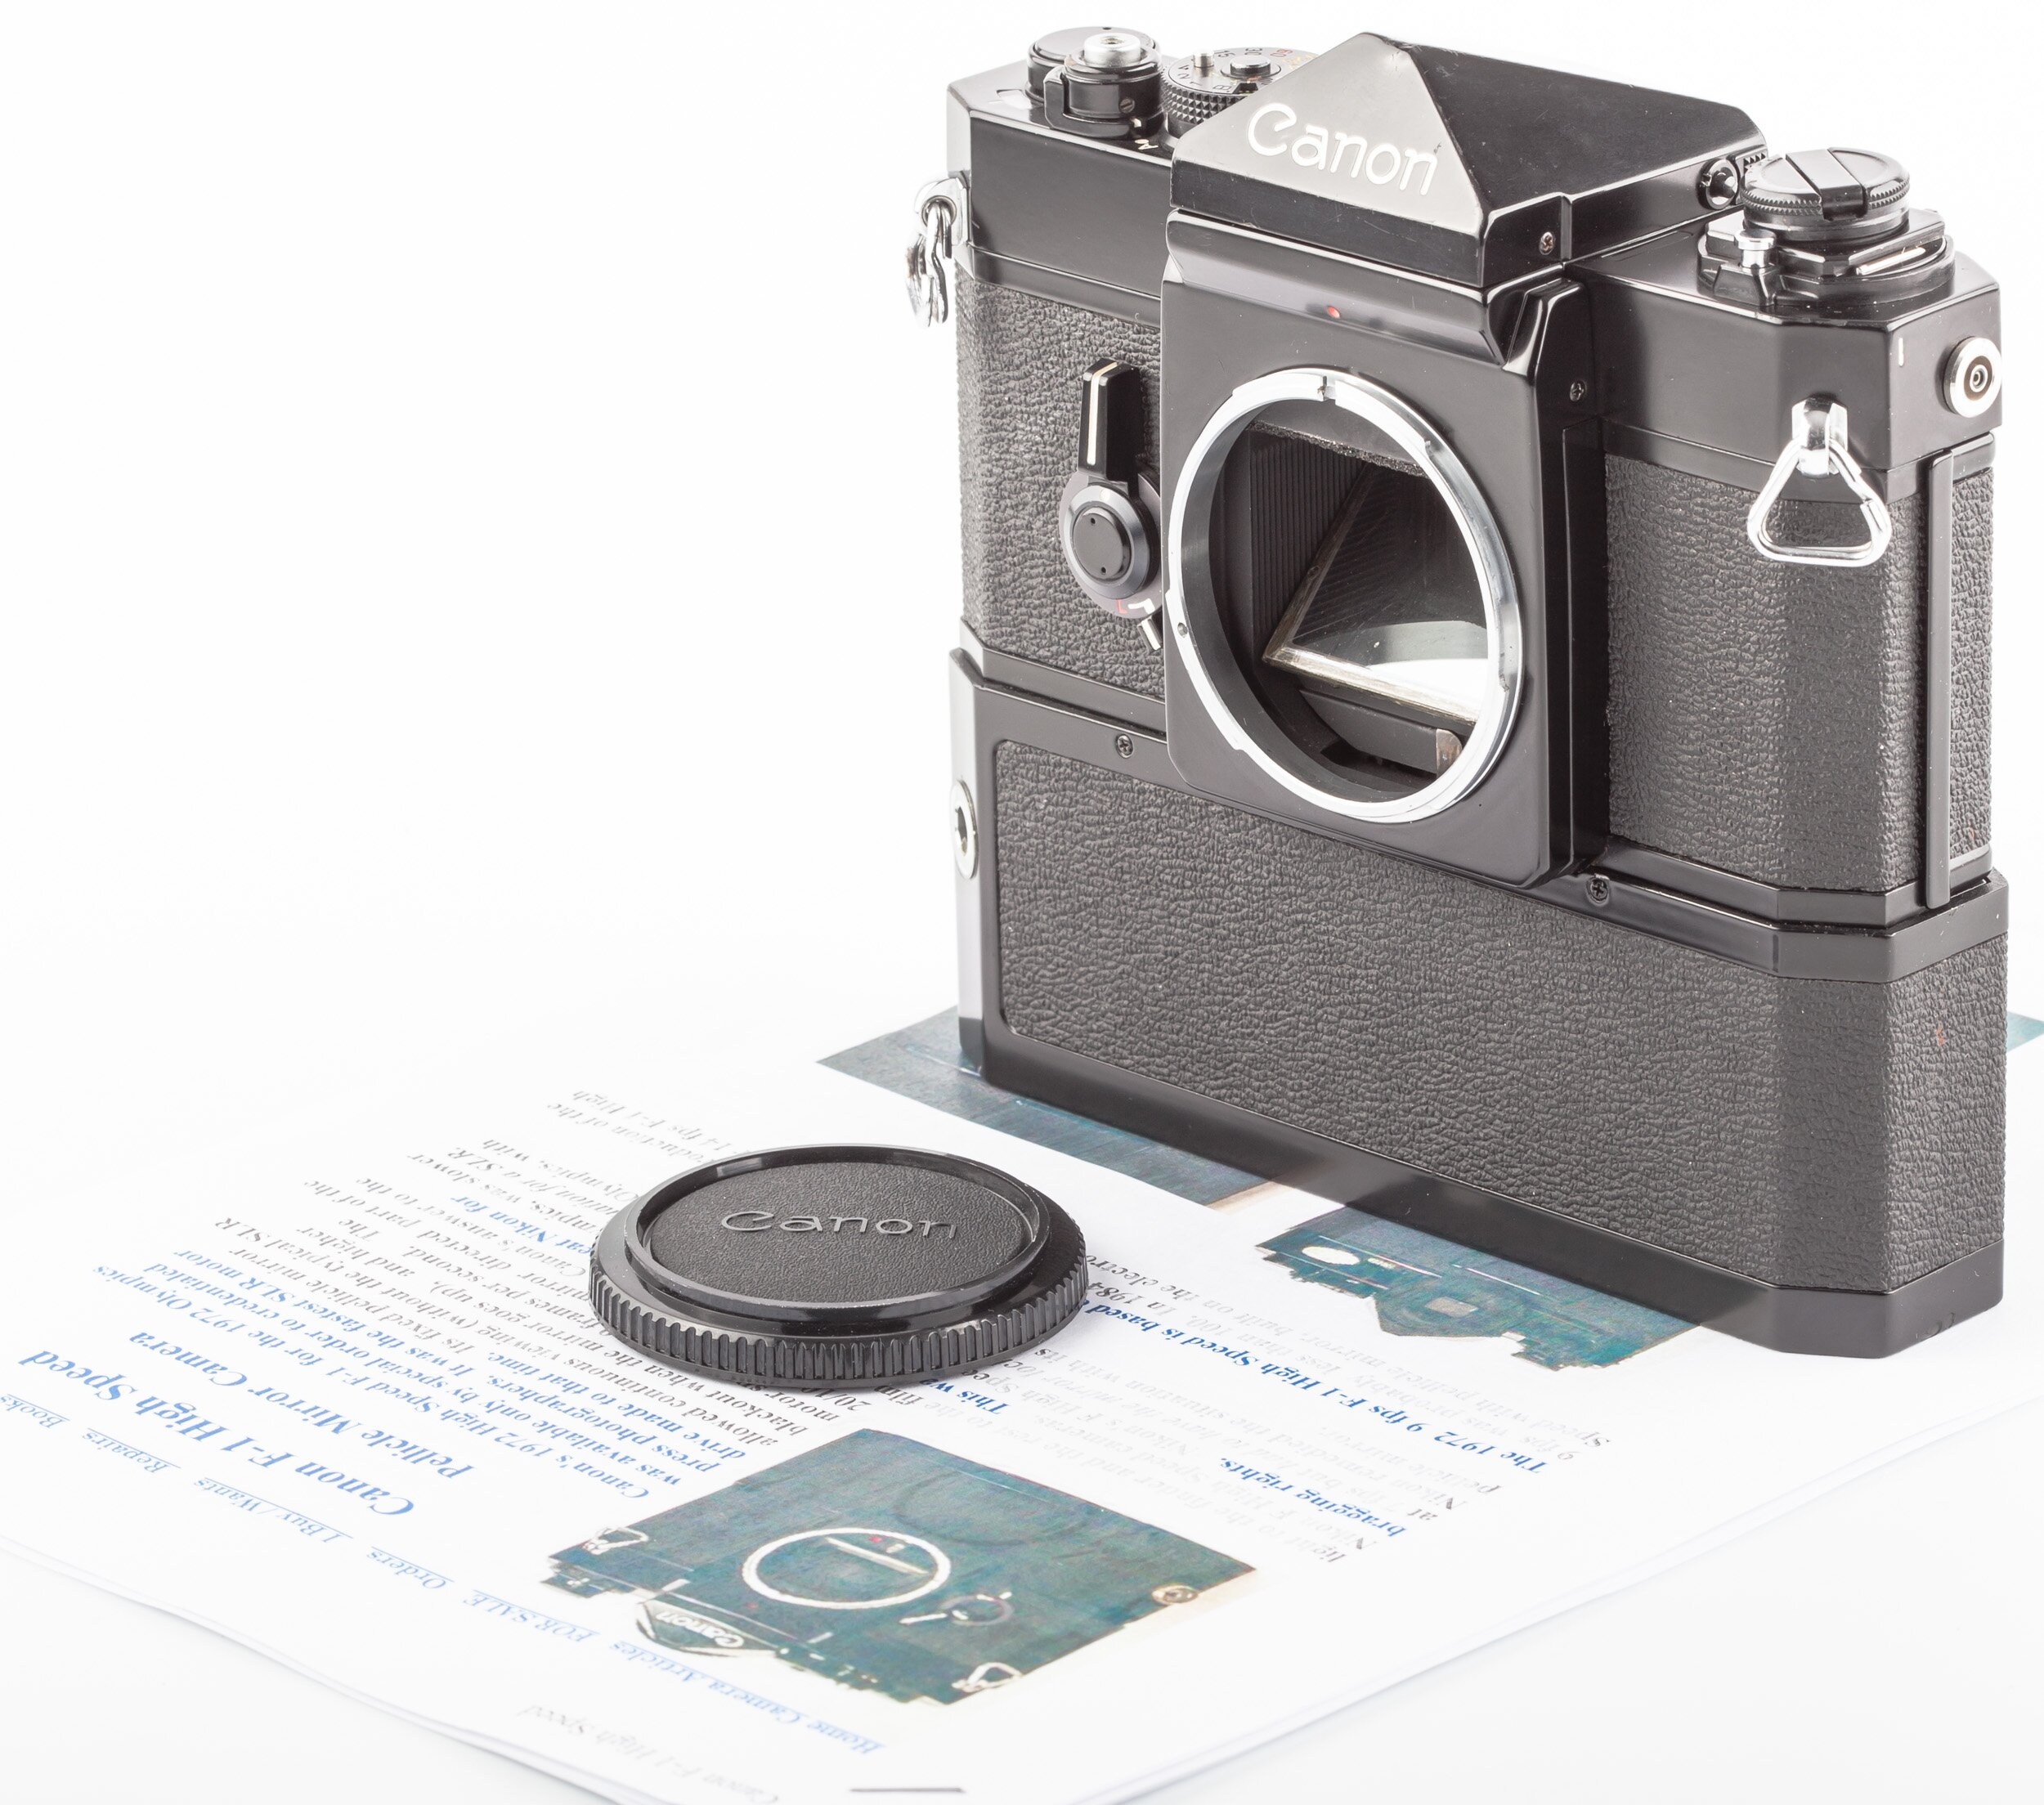 Canon F-1 High-Speed  Motor Drive Kamera sehr selten Sondermodell 1972